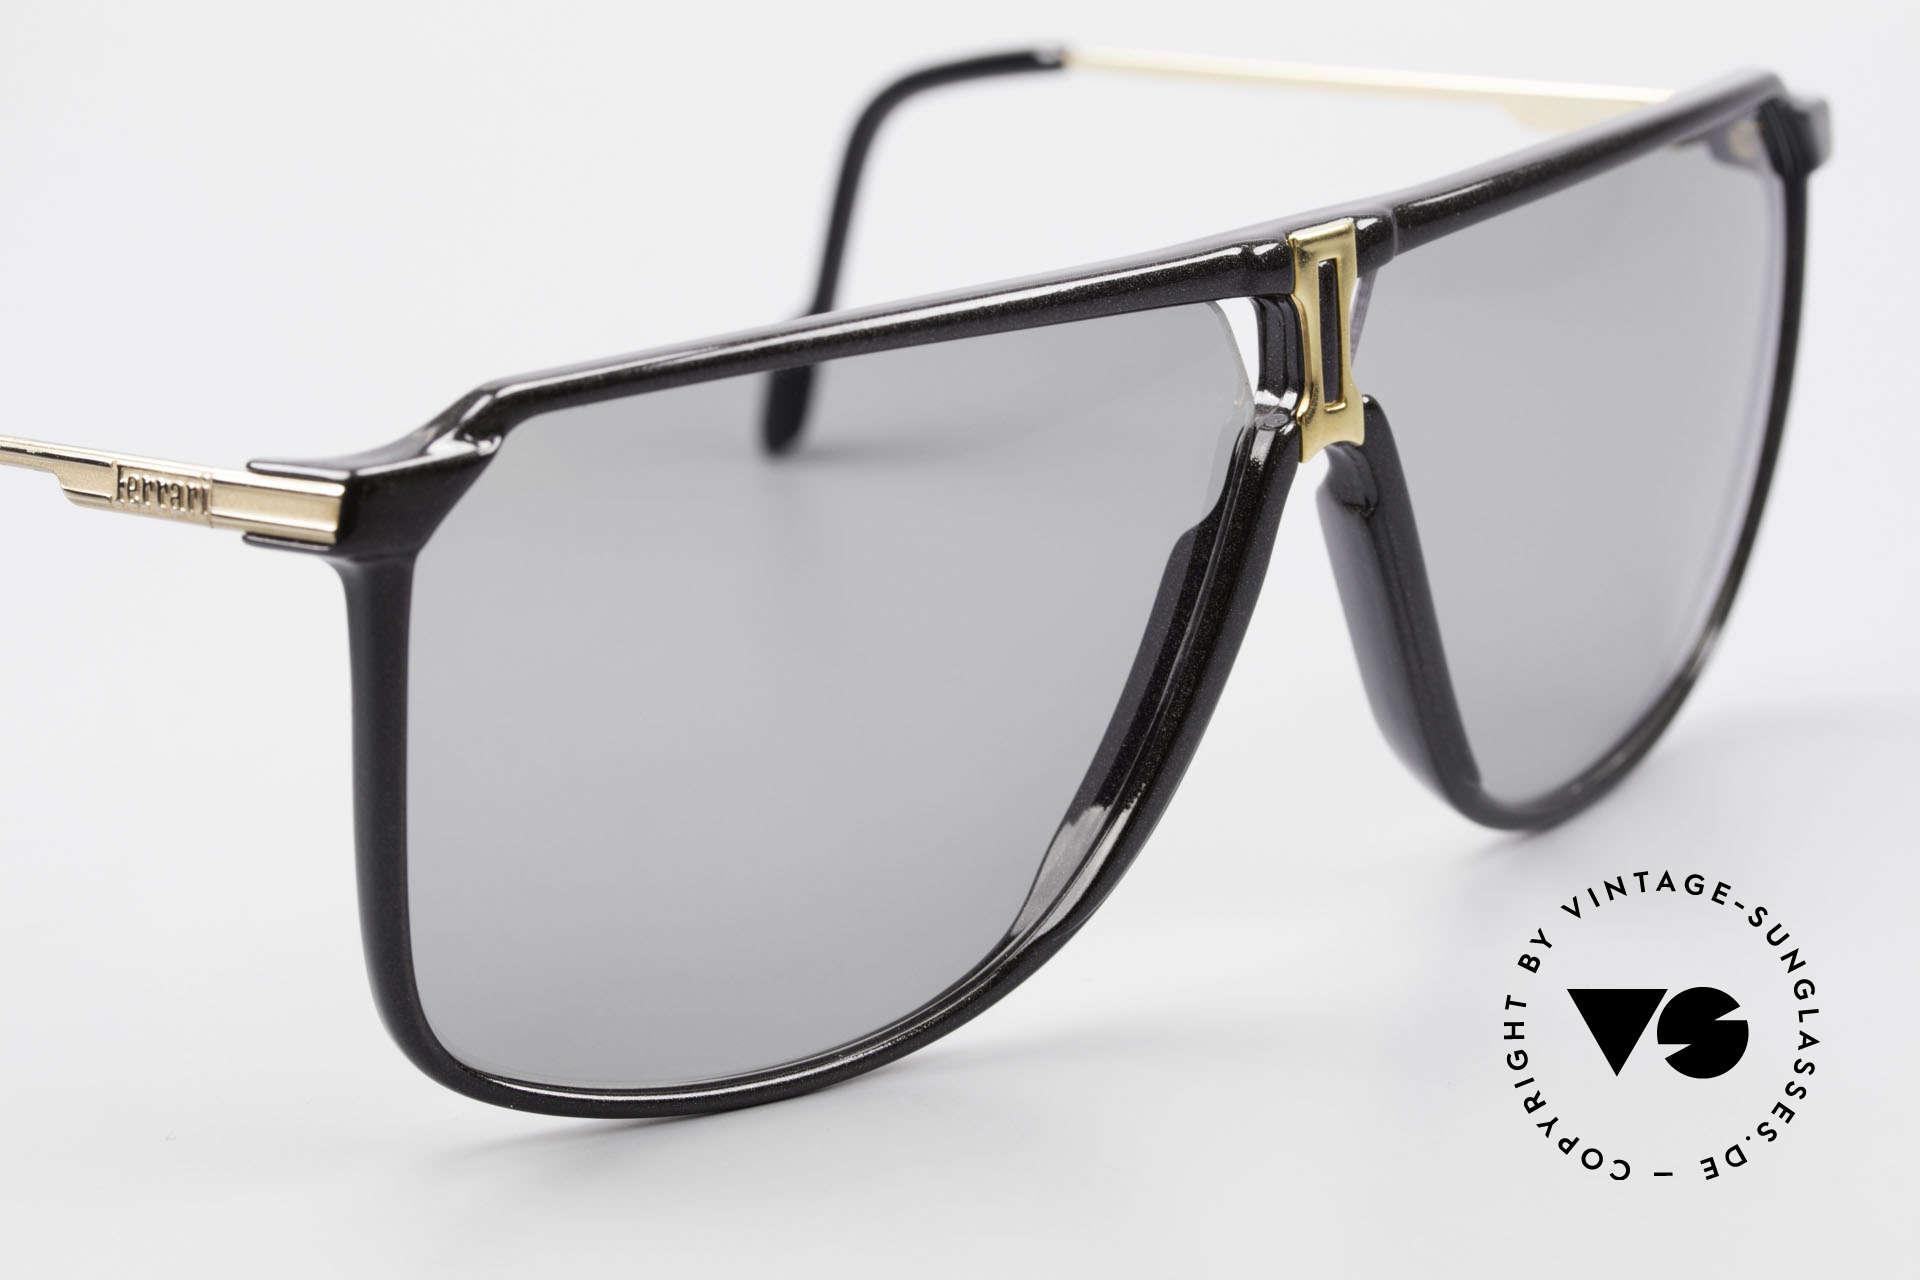 Ferrari F37/S Carbonio Sunglasses 90's XL, unworn (like all our rare Ferrari designer sunglasses), Made for Men